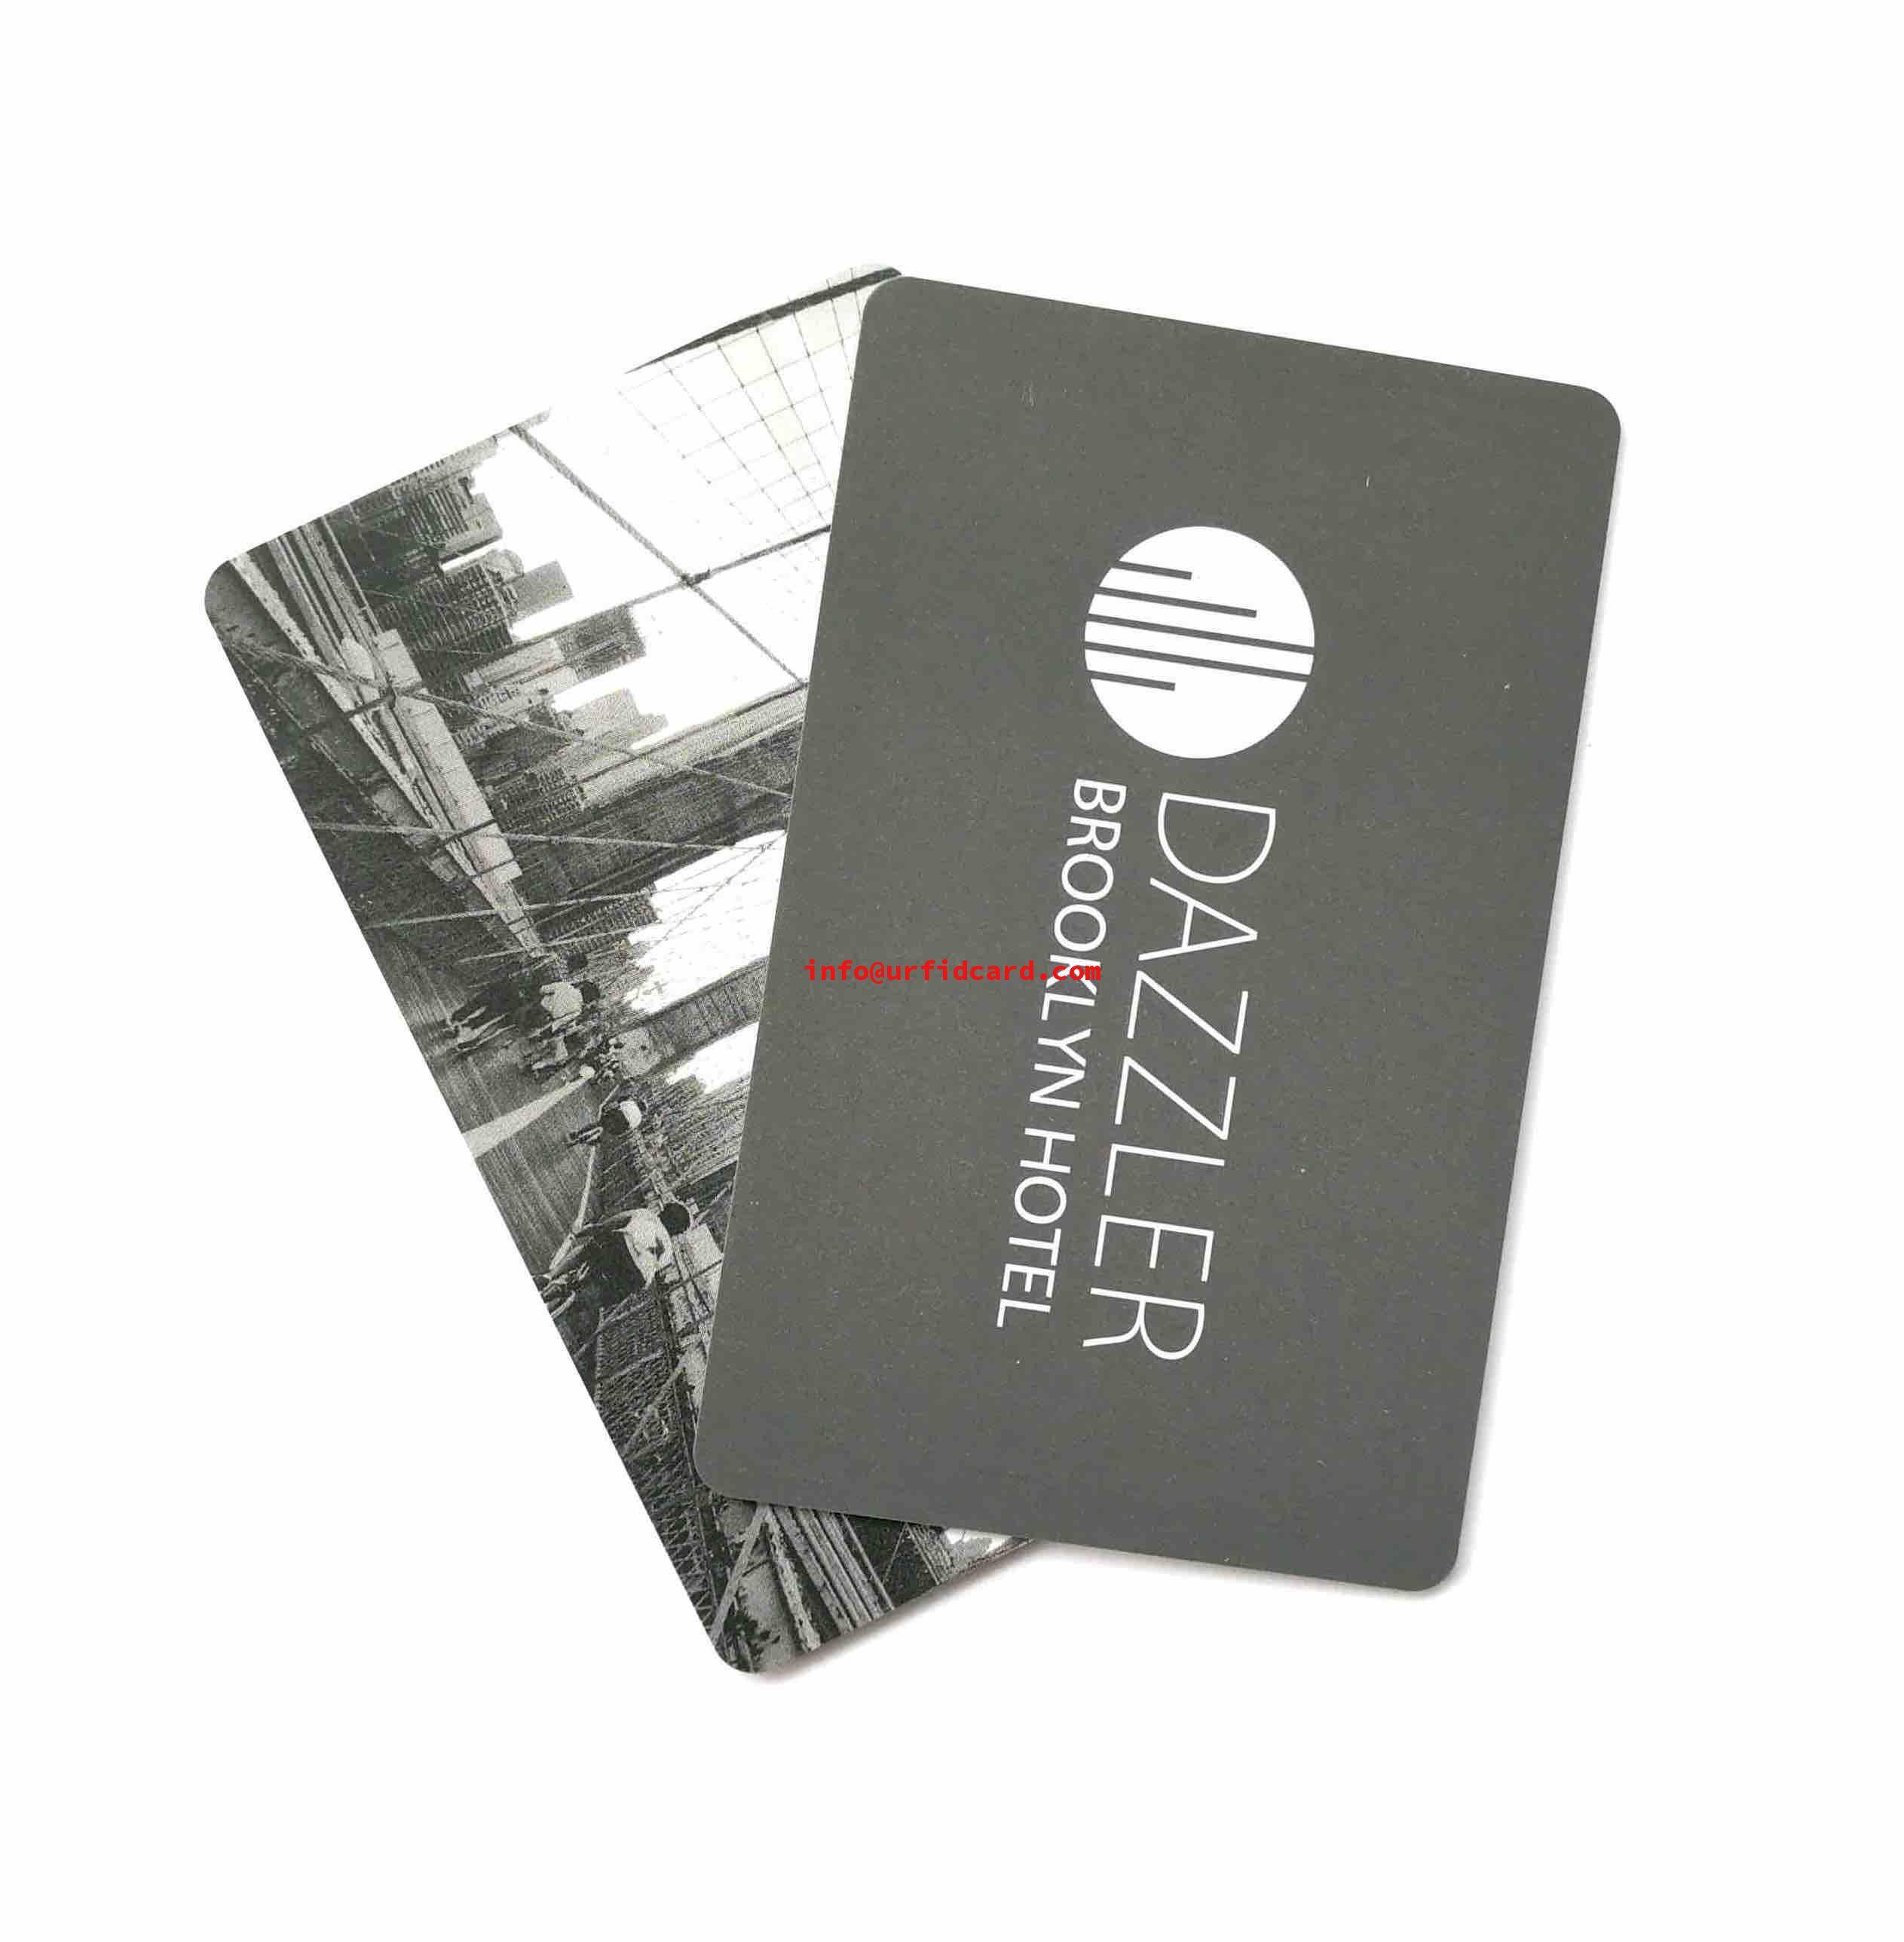 High Quality Plastic Room Key Cards